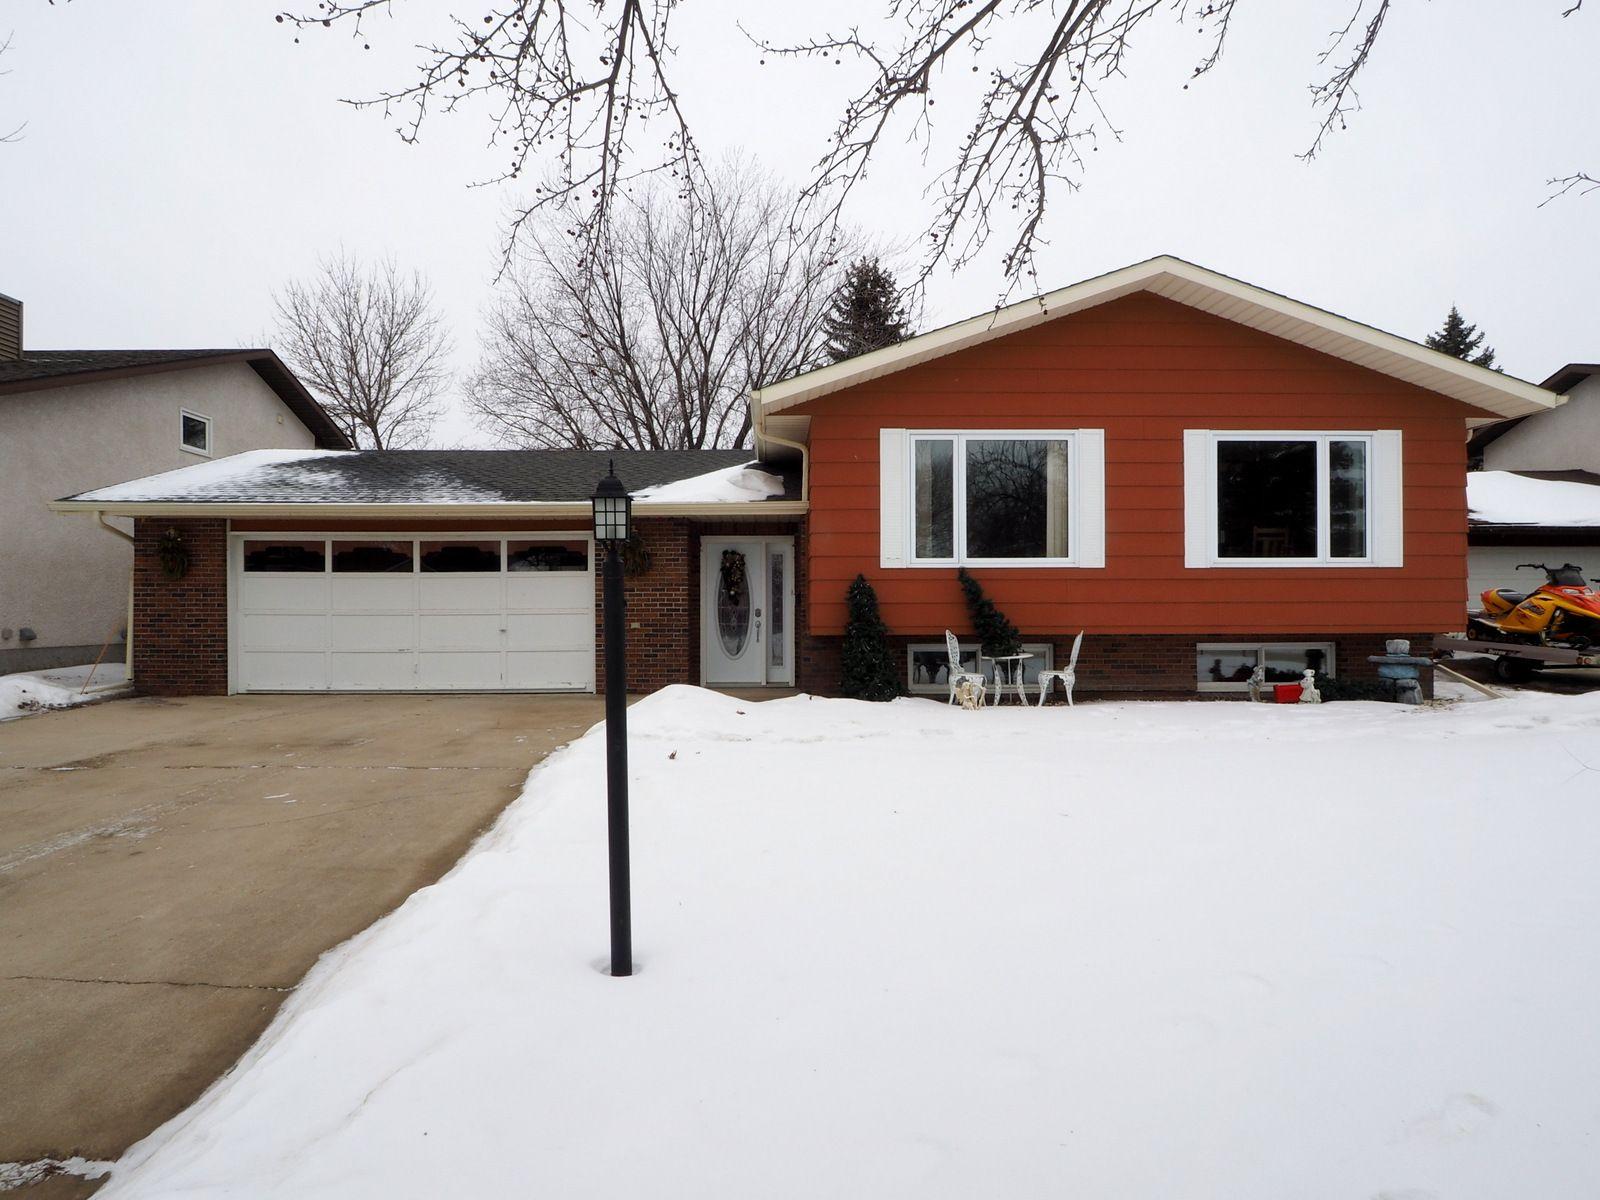 Main Photo: 36 Burns Bay in Portage la Prairie: House for sale : MLS®# 202102273